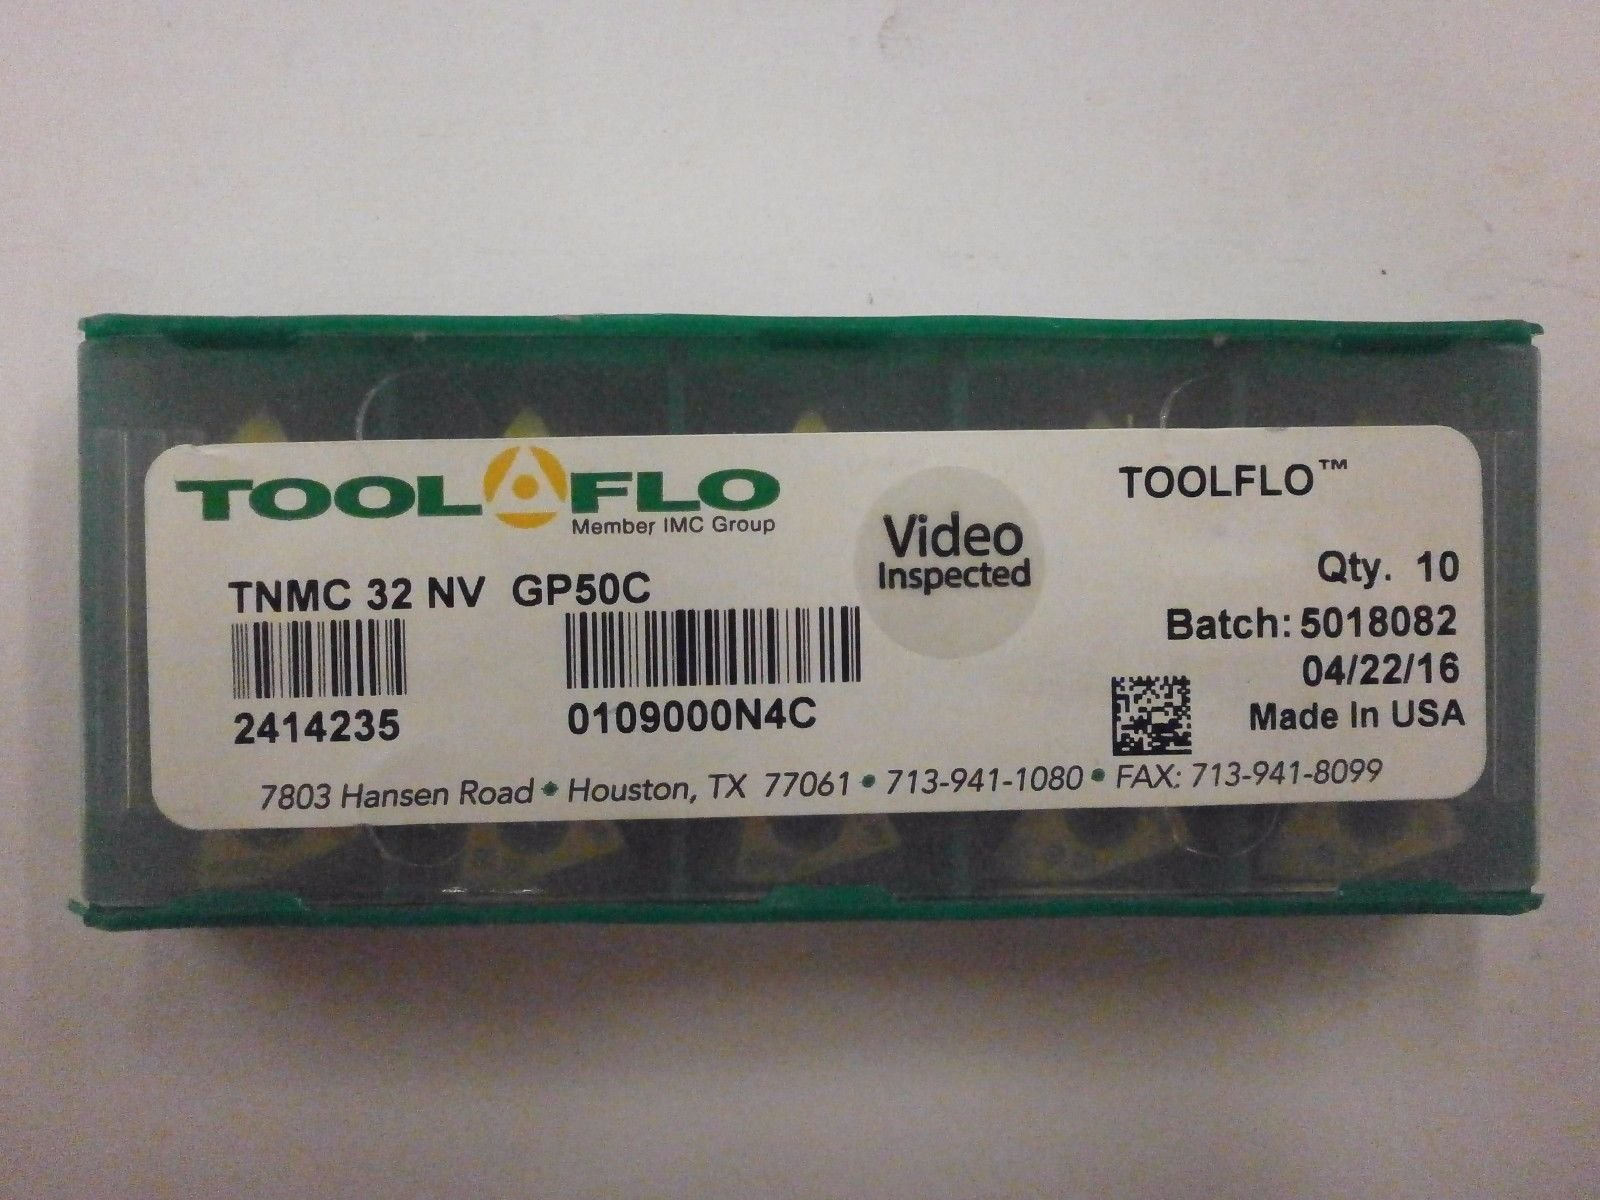 10pc) ToolFlo TNMC 32NV GP50C ON-EDGE Coated Carbide 60° V Threading Inserts